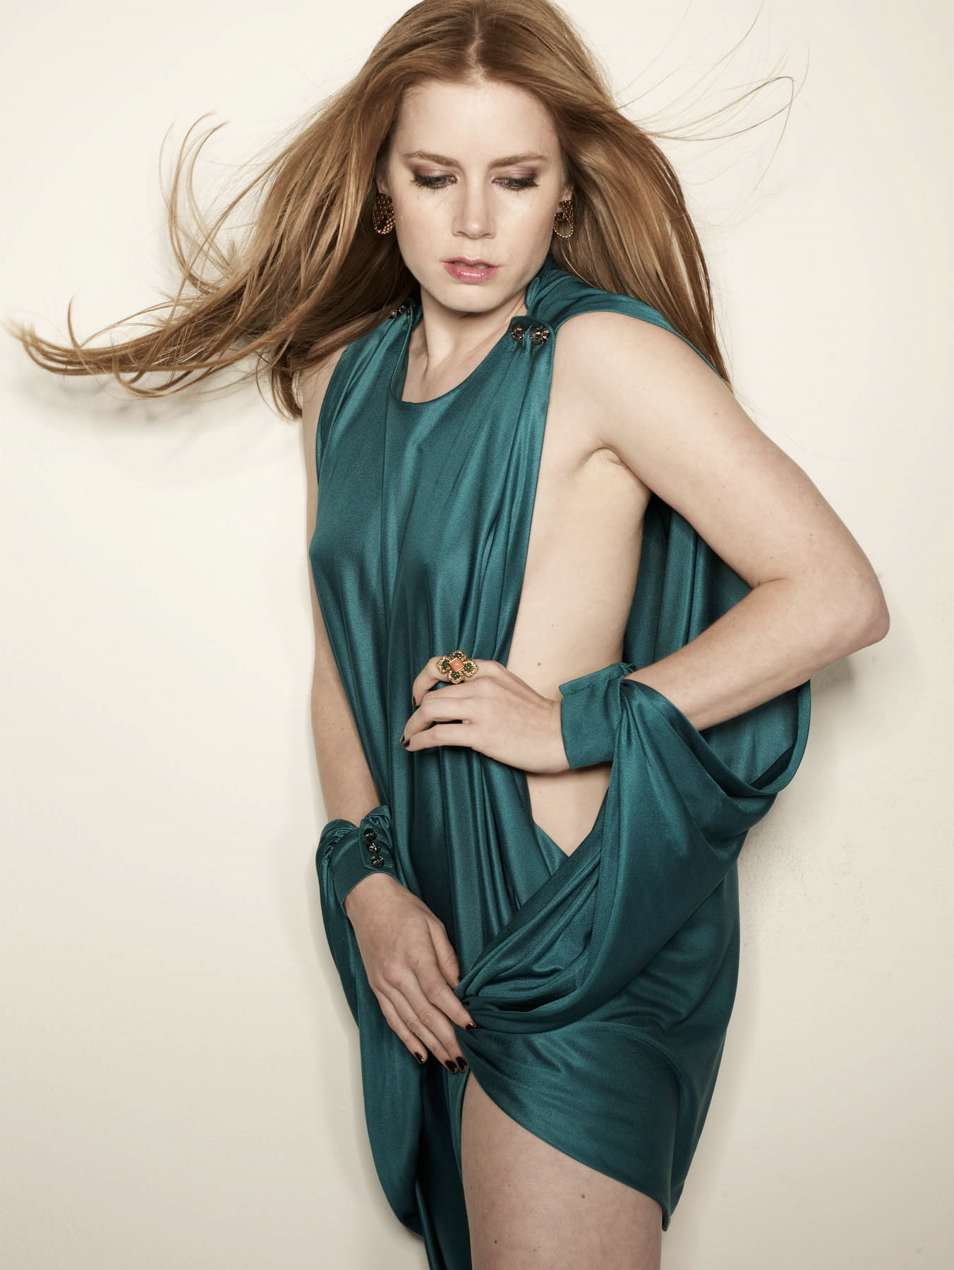 Rosetta Thorne Amy_adams_hot_08